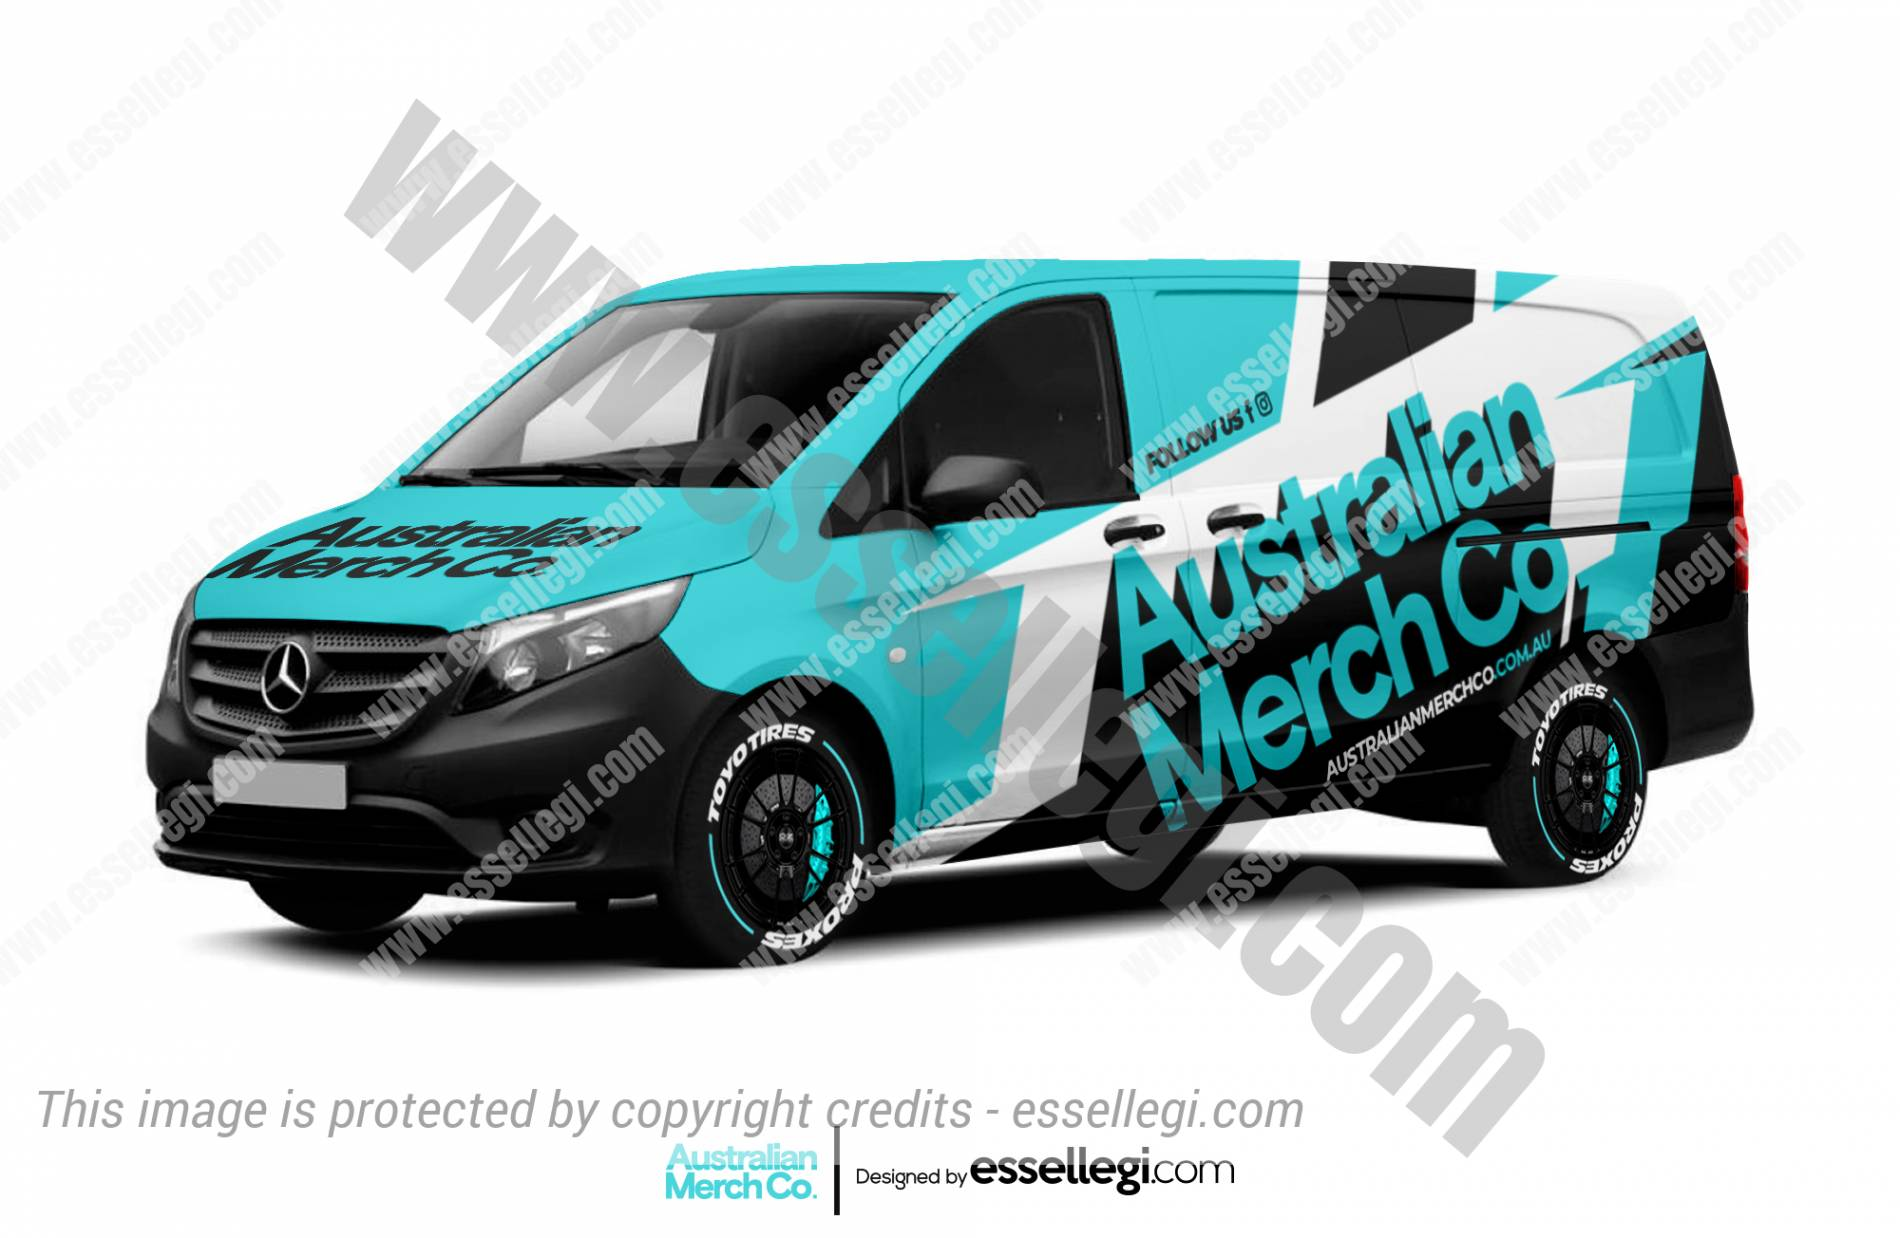 Mercedes Vito Wrap Design. Mercedes Vito | Van Wrap Design by Essellegi. Van Signs, Van Signage, Van Wrapping, Van Signwriting, Van Wrap Designer, Signs for Van, Van Logo, Van Graphic by Essellegi.